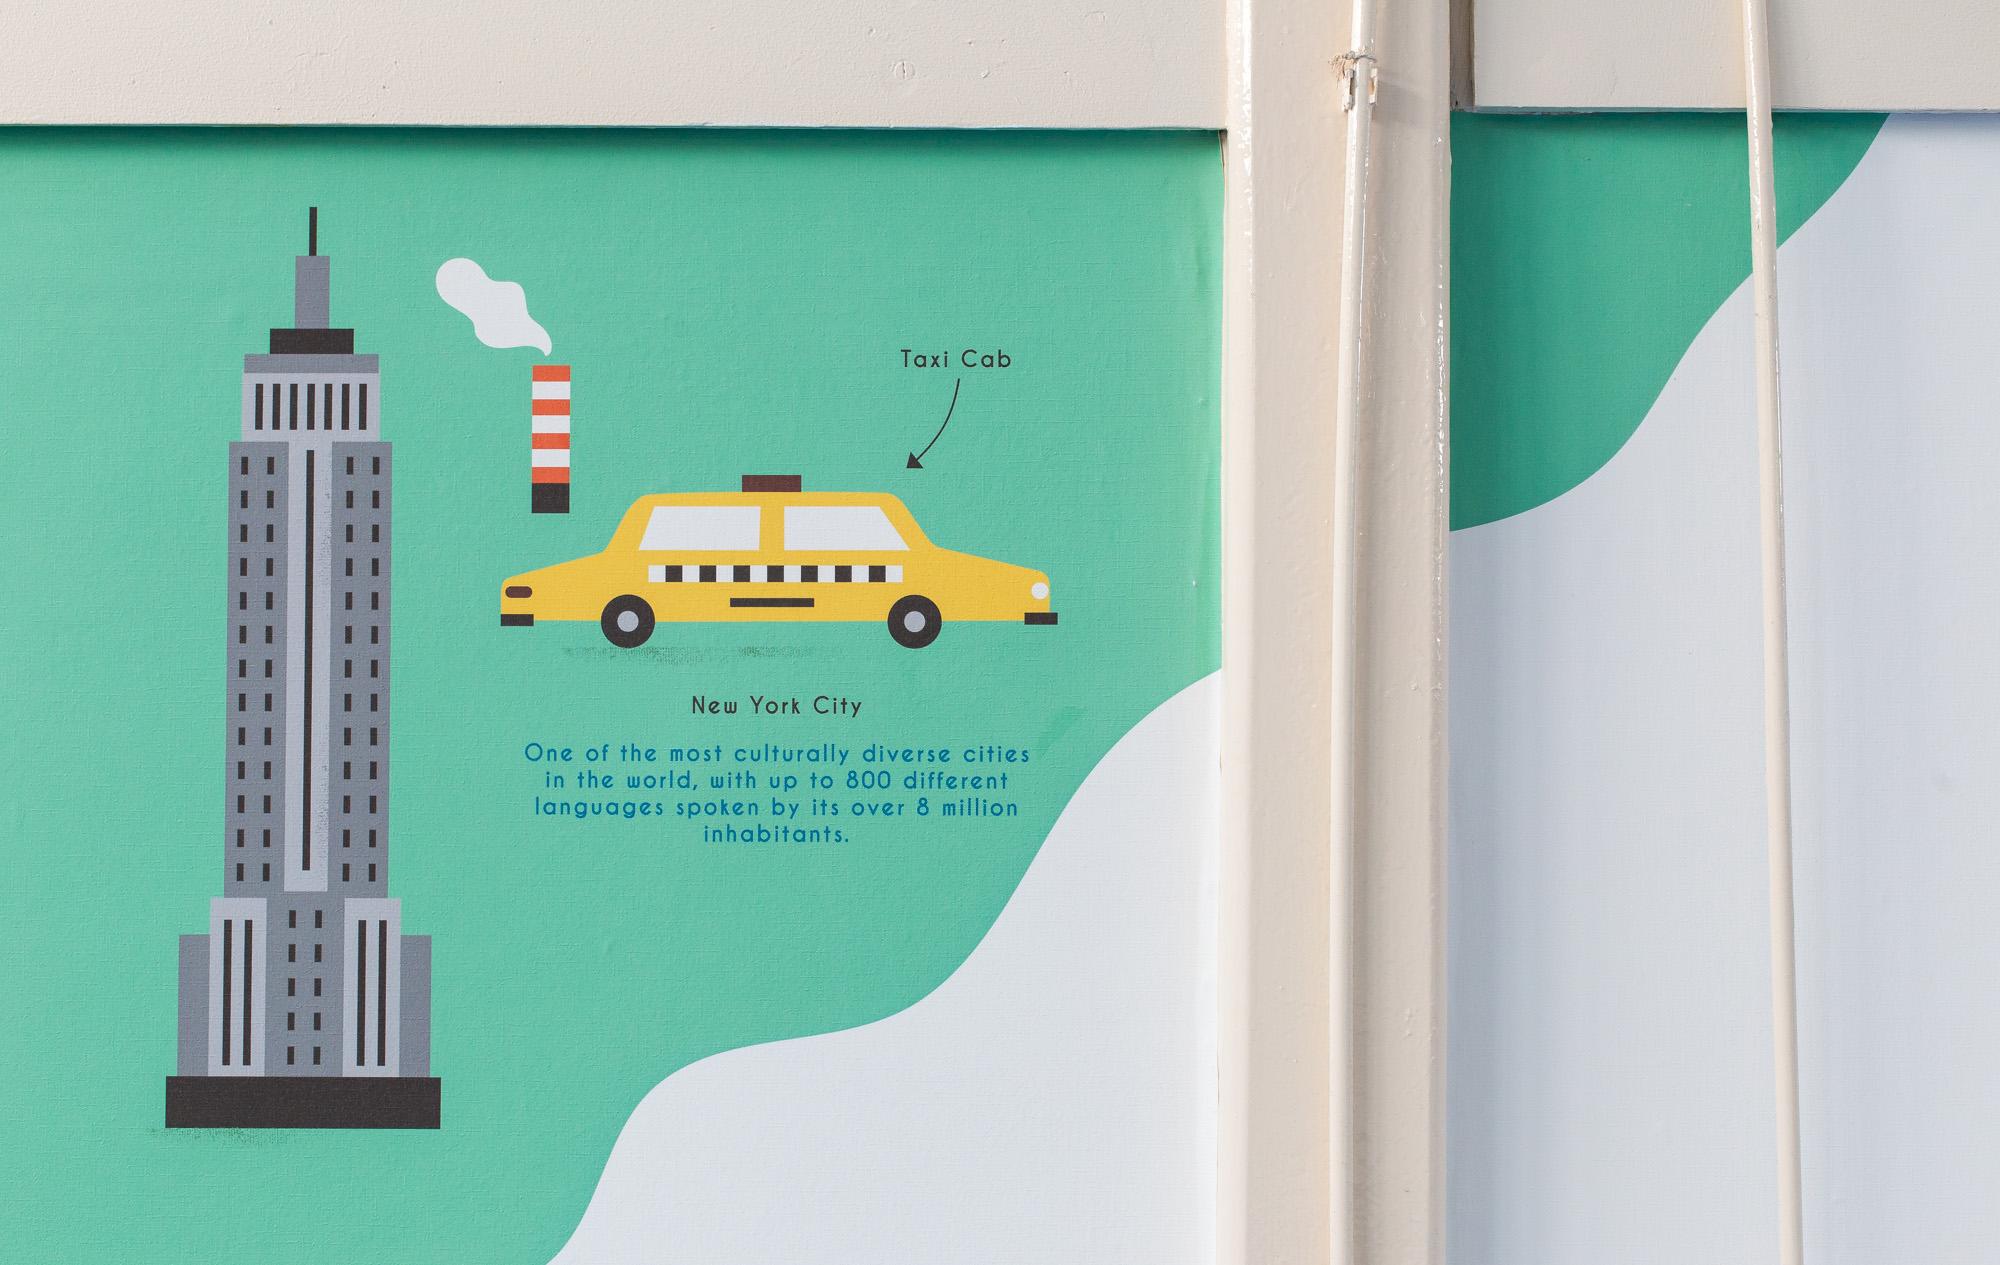 hannahalice-illustration-spacedesign-world-map-grazebrookprimaryschool-mural-newyork-taxi-empirestate-wallpaper.jpg